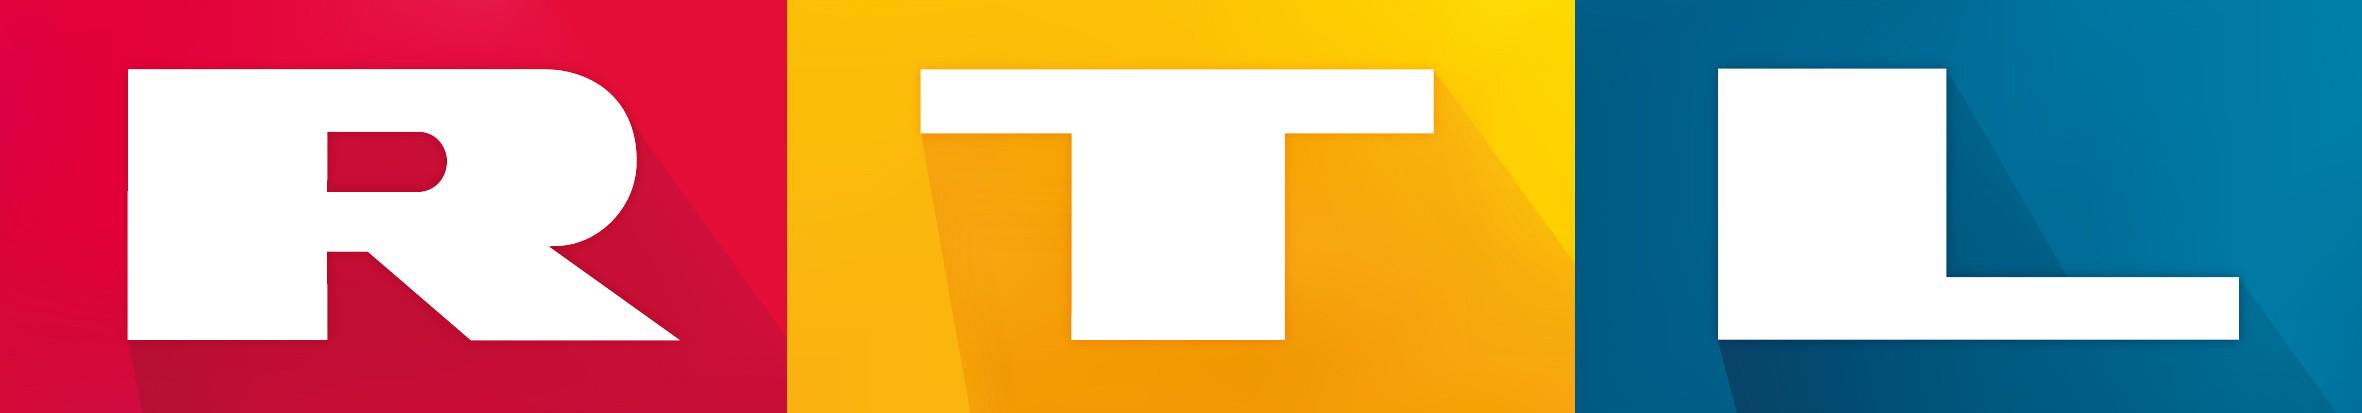 Dateirtl Logo Ab Dem 1 September 2017png Wikipedia